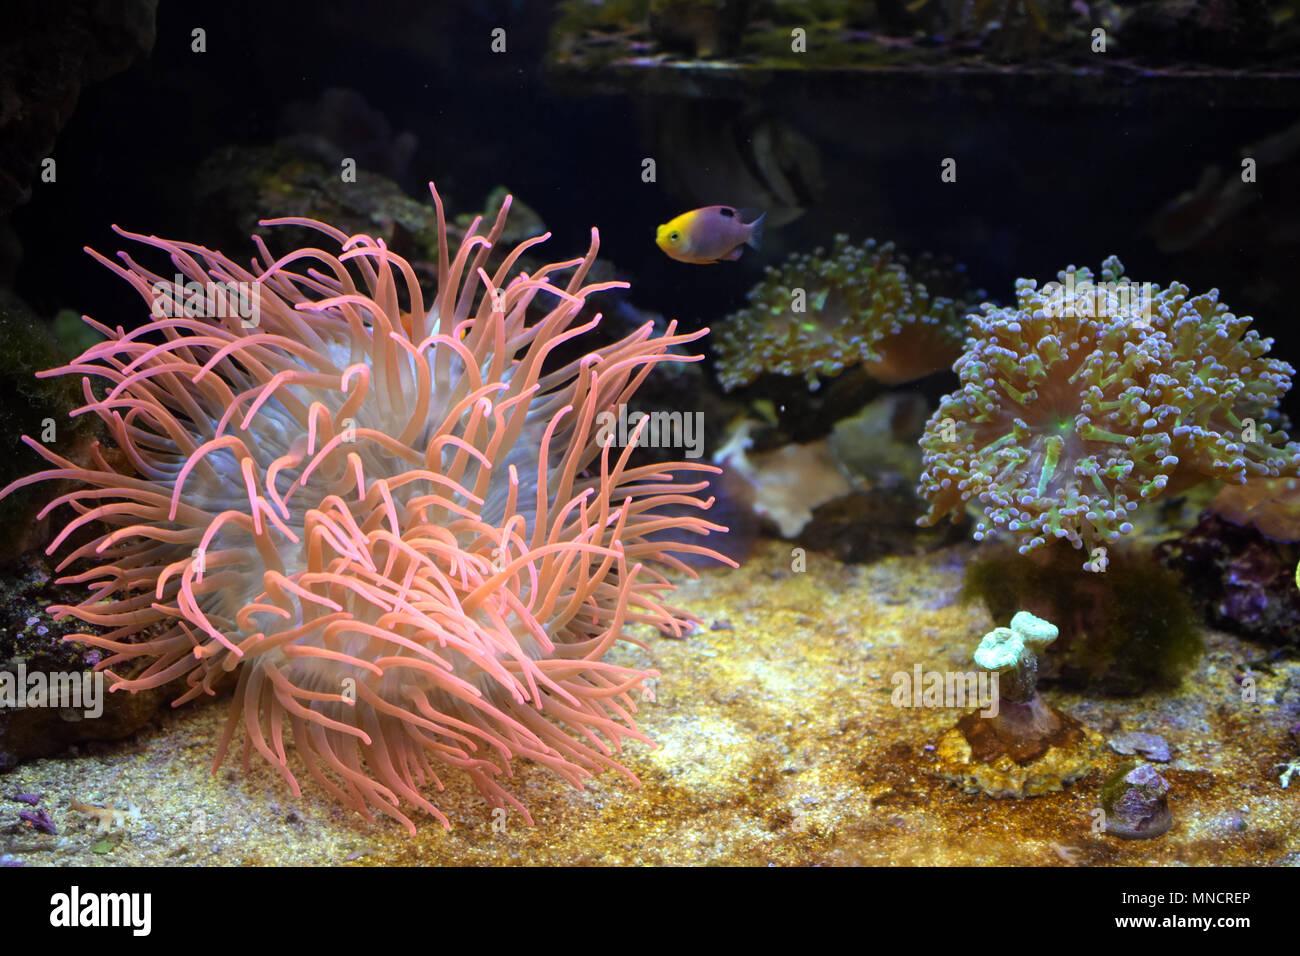 sea anemone wallpaper background